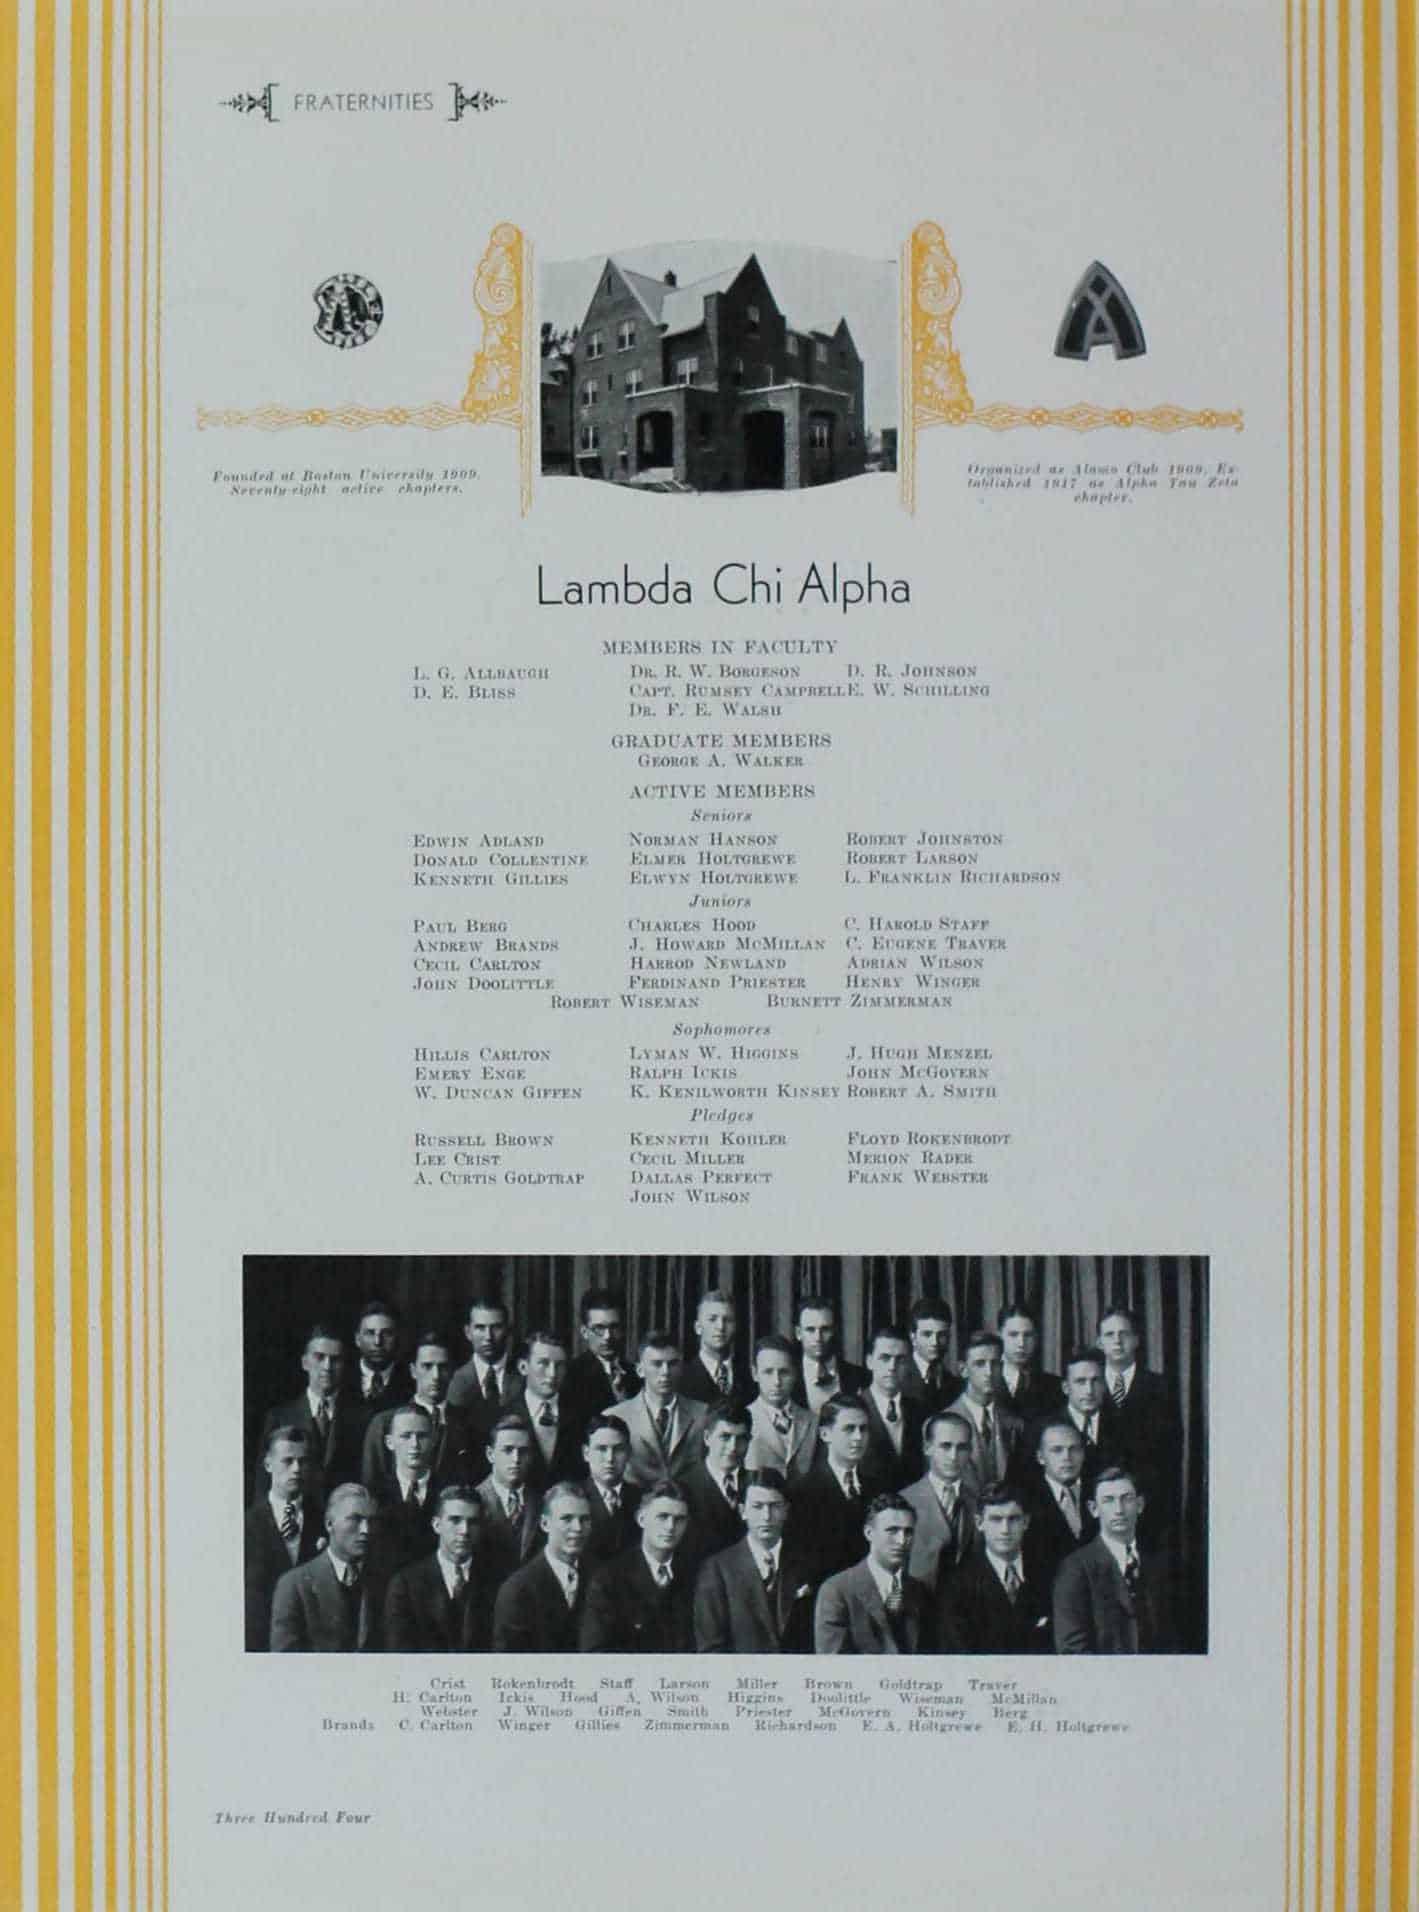 1930 Lambda Chi Alpha